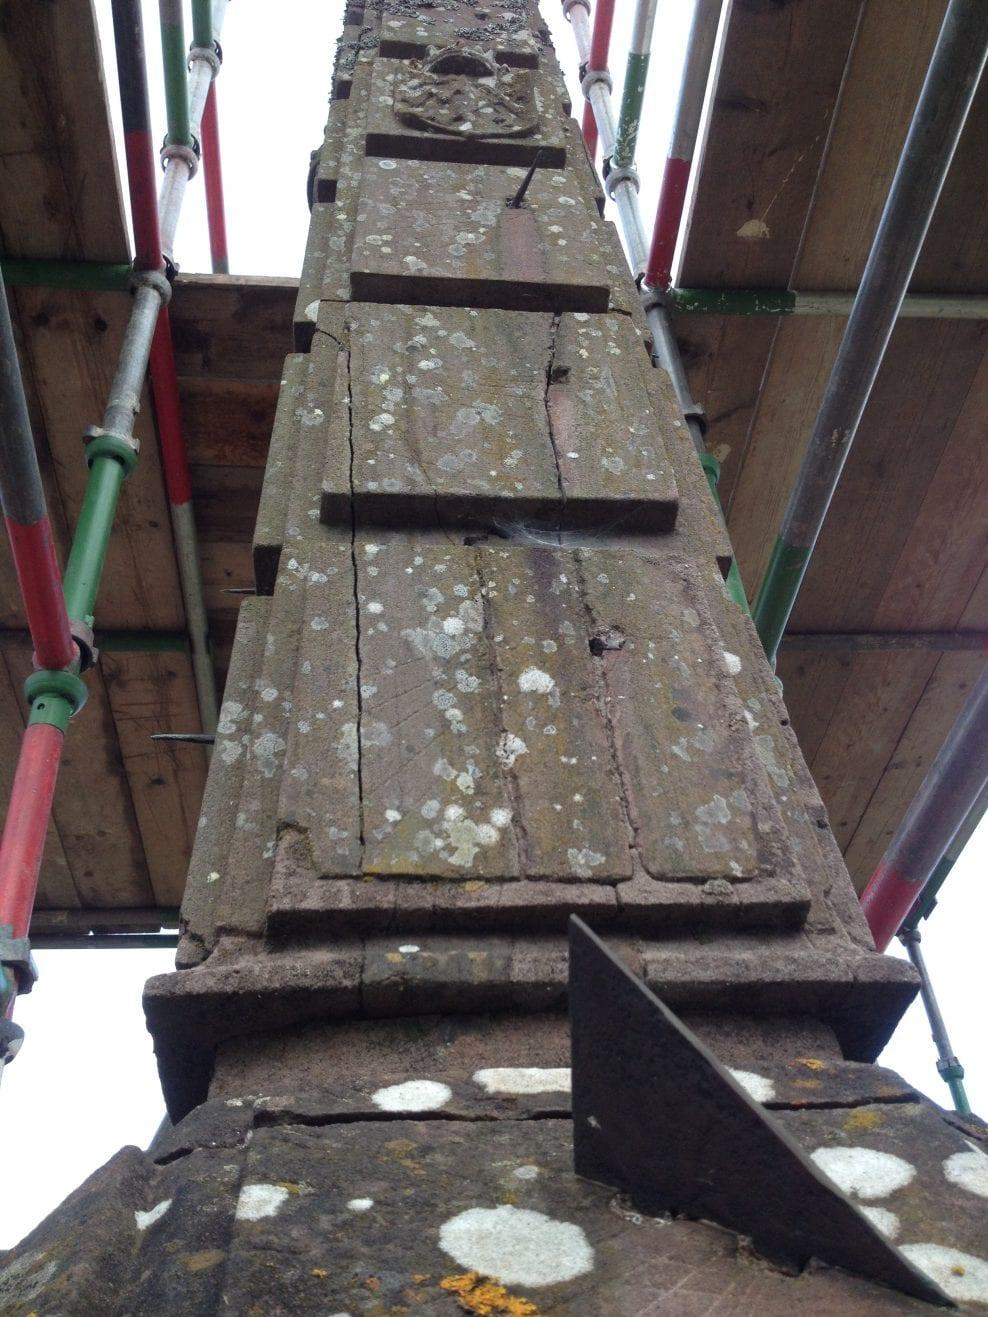 Drummond Castle Obelisk Sundial structural deterioration issues before dismantling in 2017